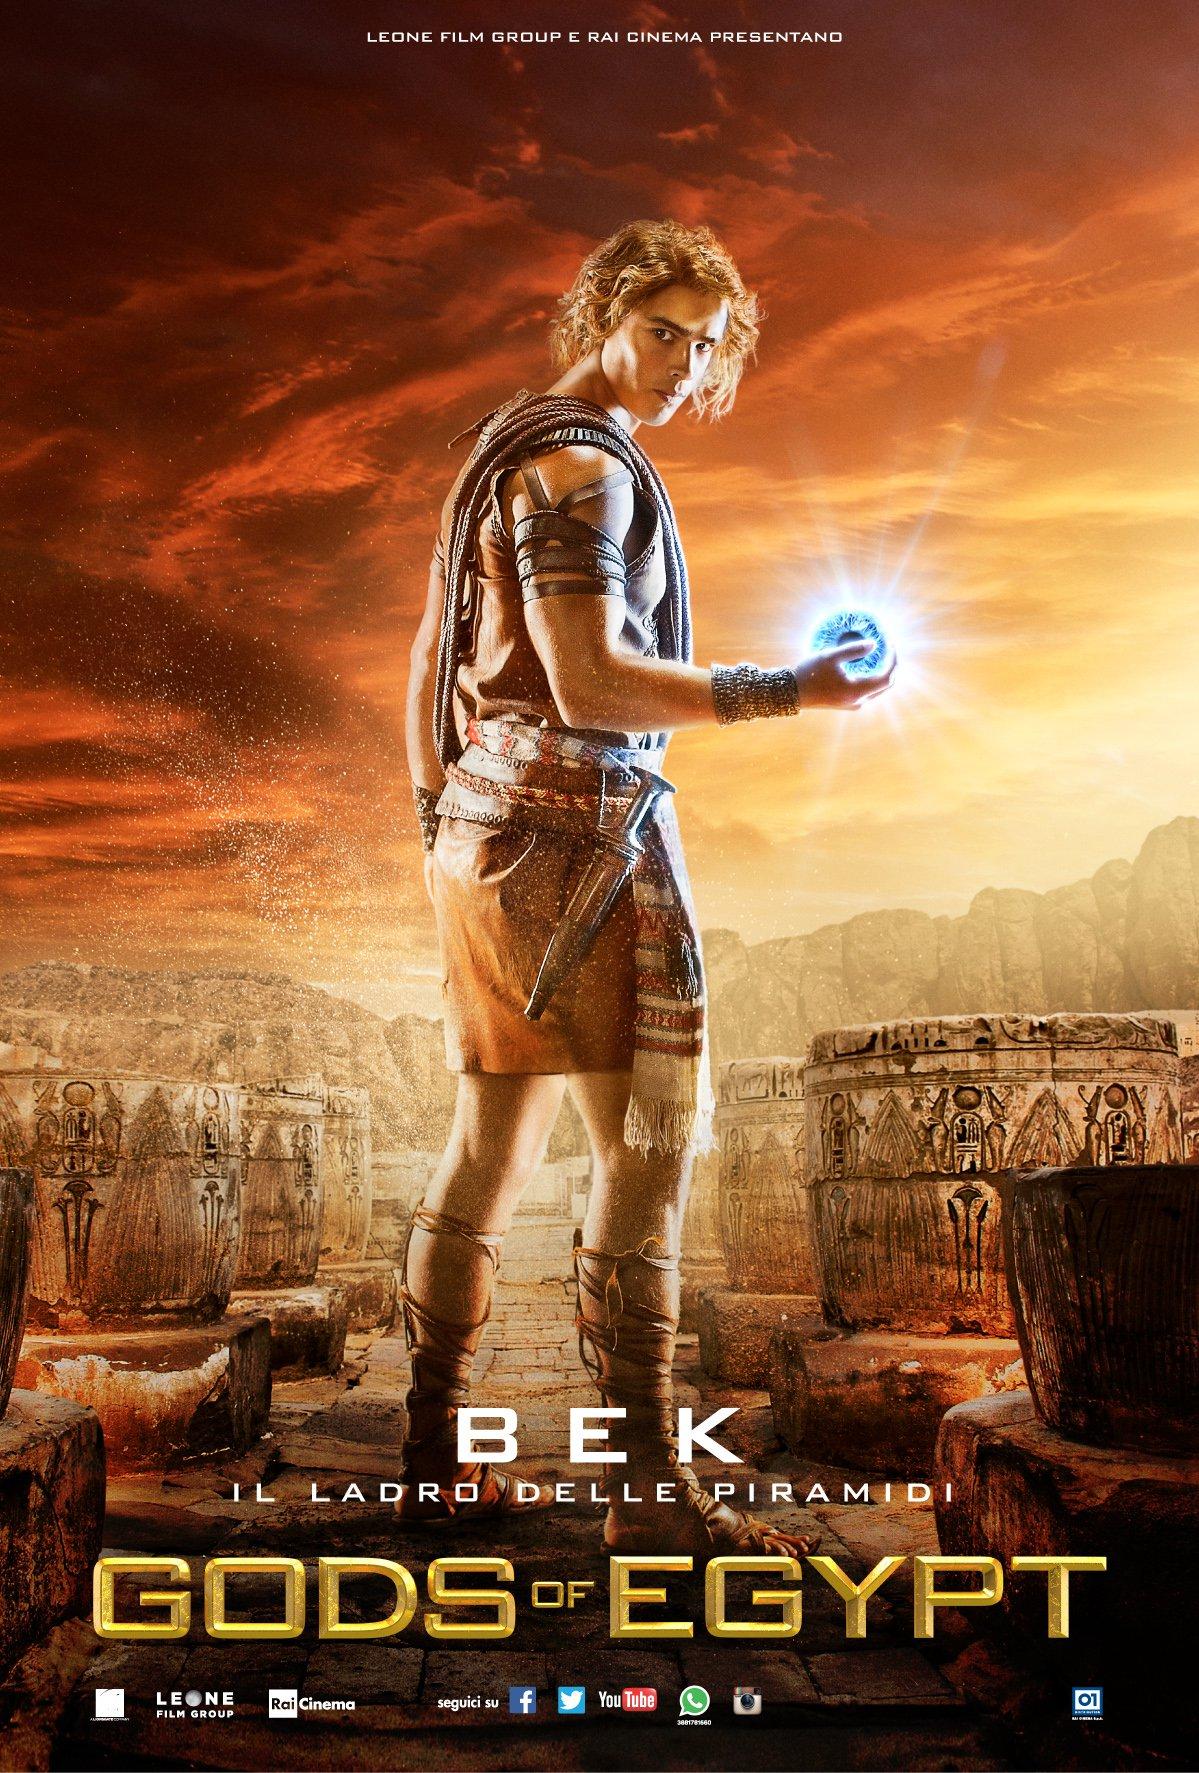 Gods of Egypt: il character poster italiano di Bek